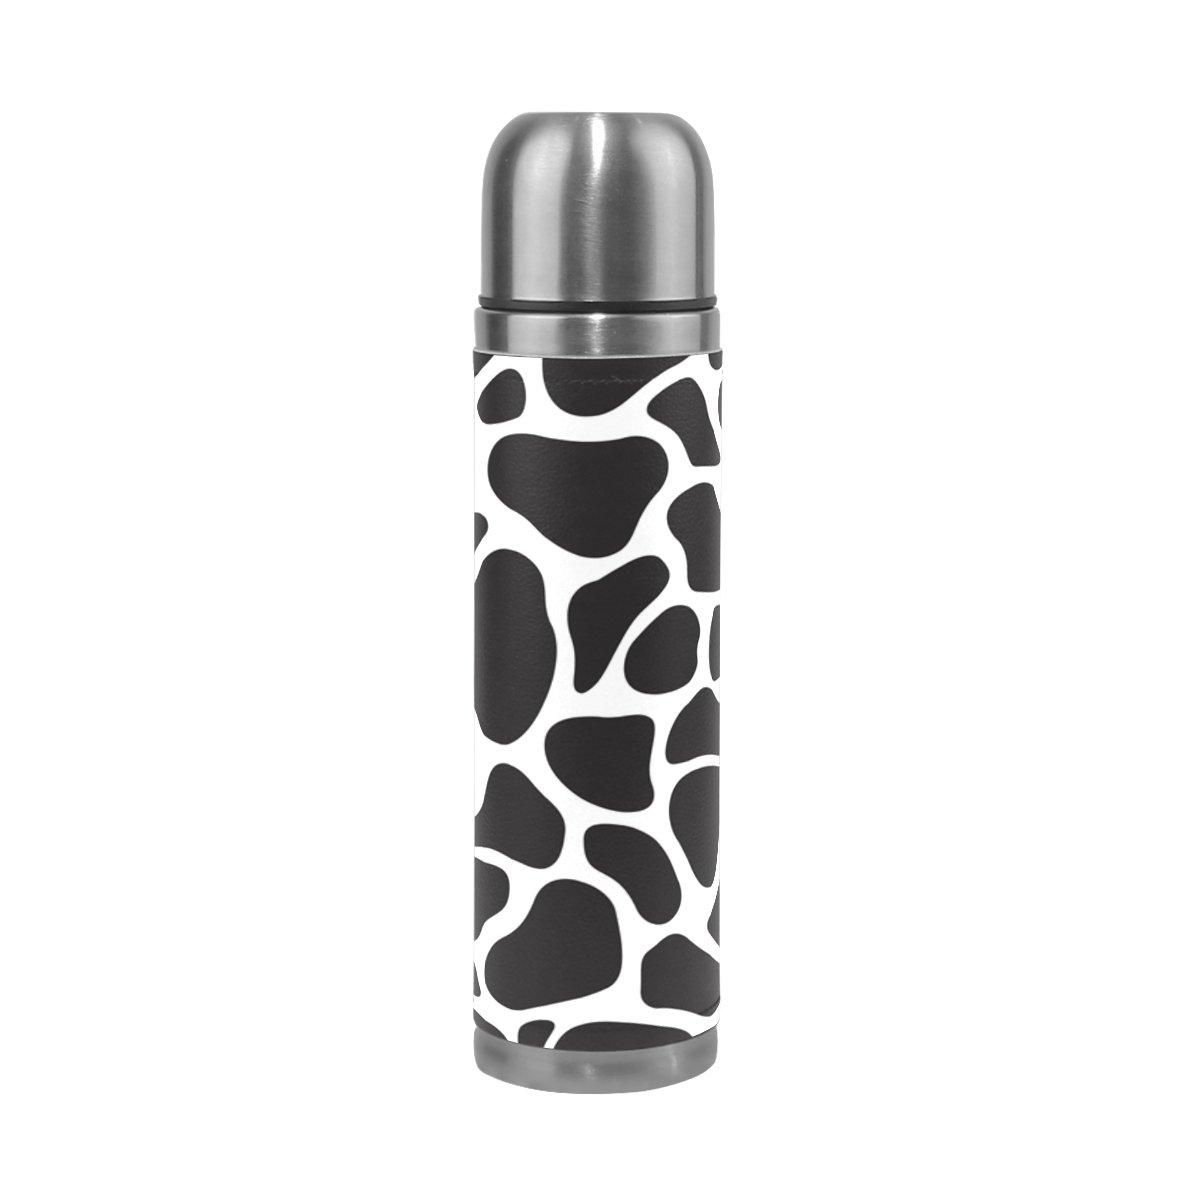 JSTeL cozebraキリン迷彩ステンレススチールウォーターボトル真空断熱真空ボトルを漏れ防止ダブルホットコーヒーまたはコールドティー+ Drink Cup Top 500 ml B078YLTX54